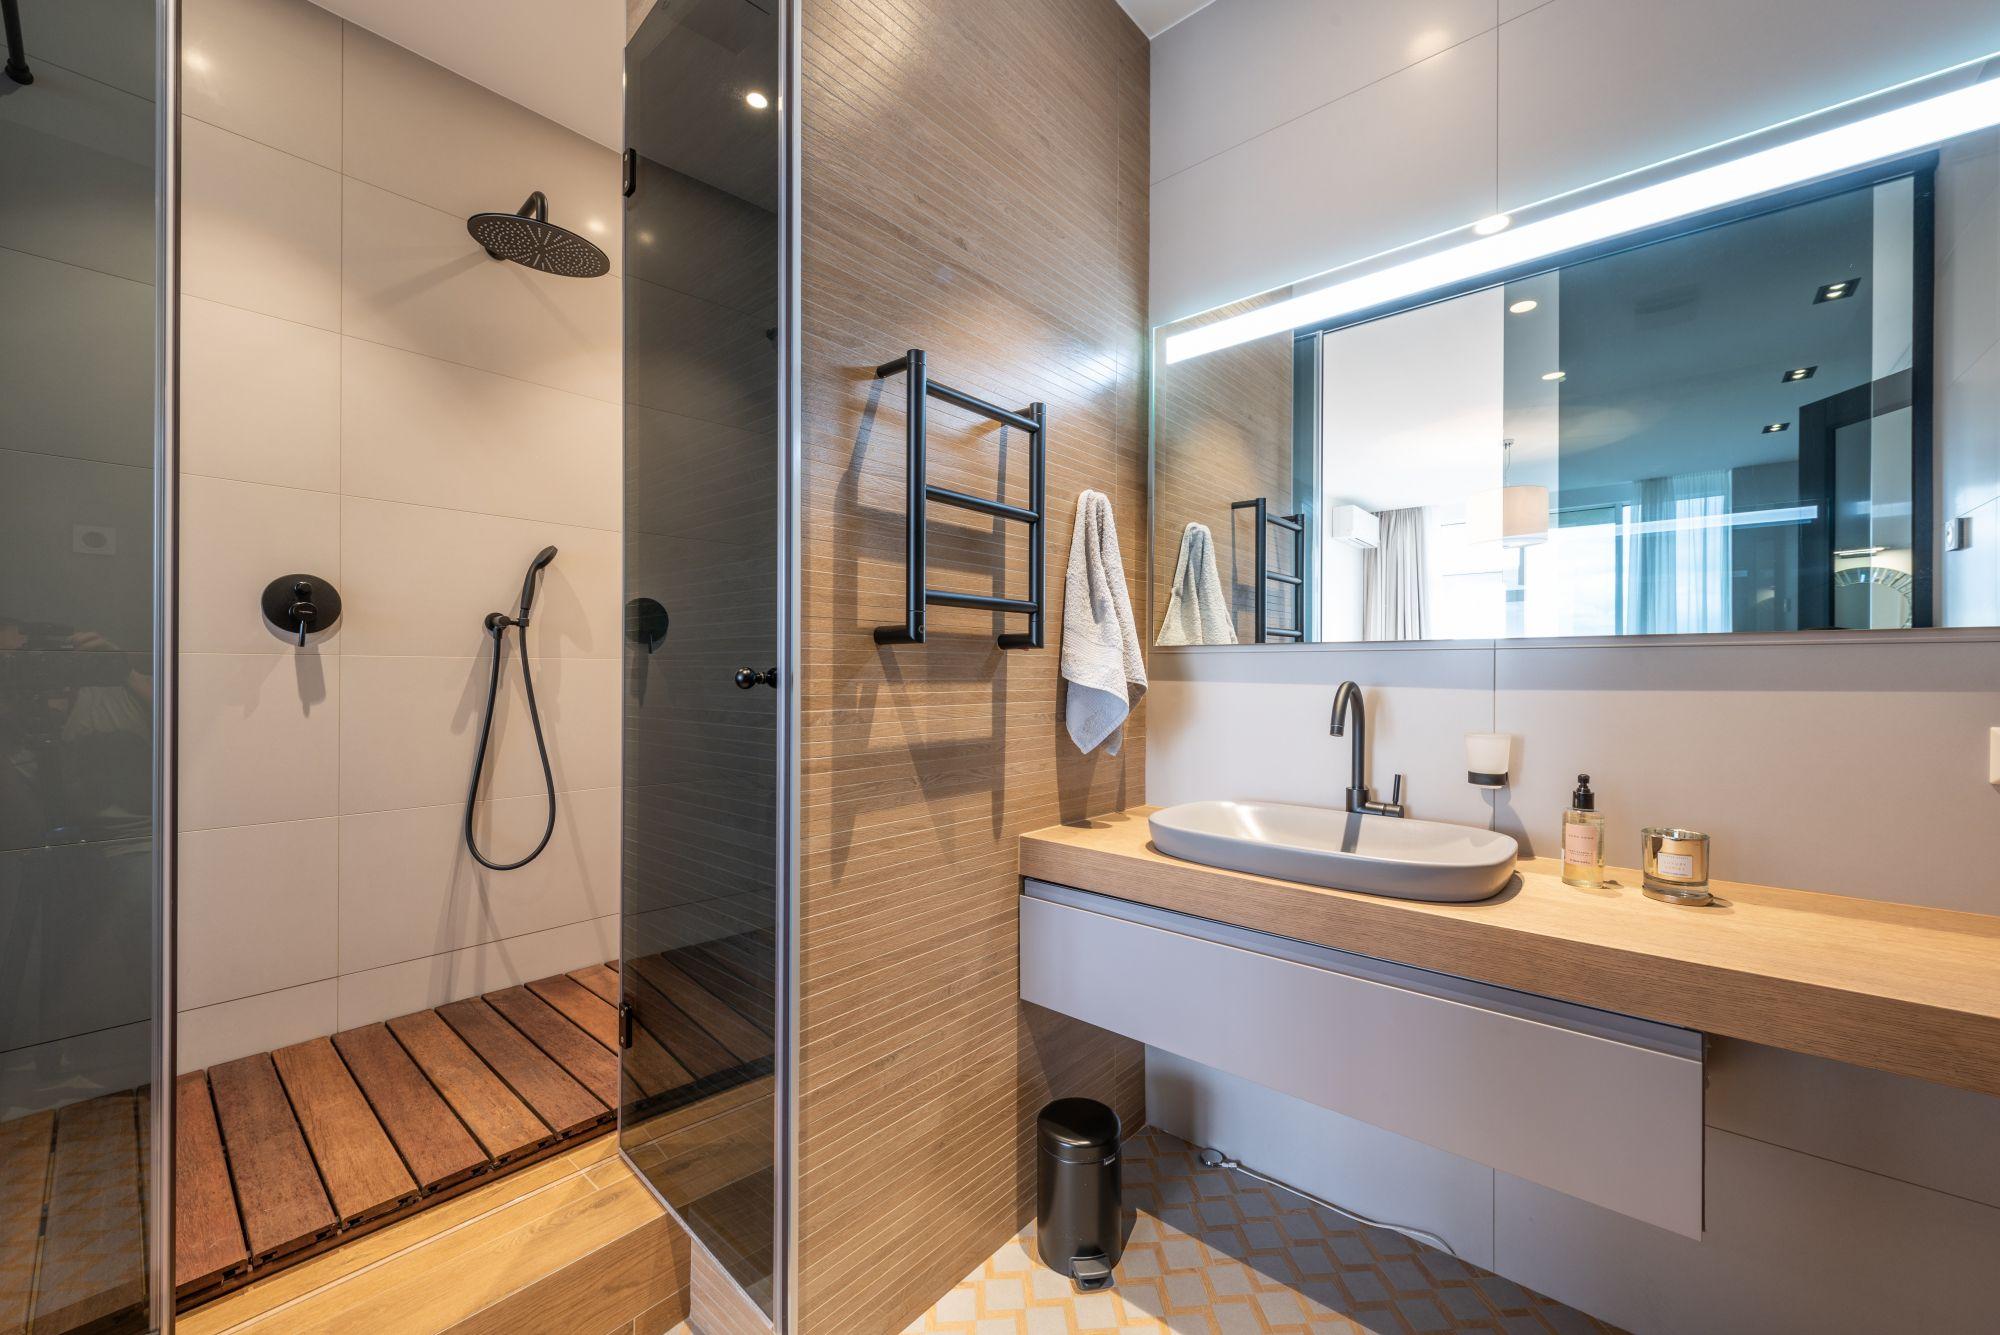 Arredo bagno: essenziale kit da lavandino